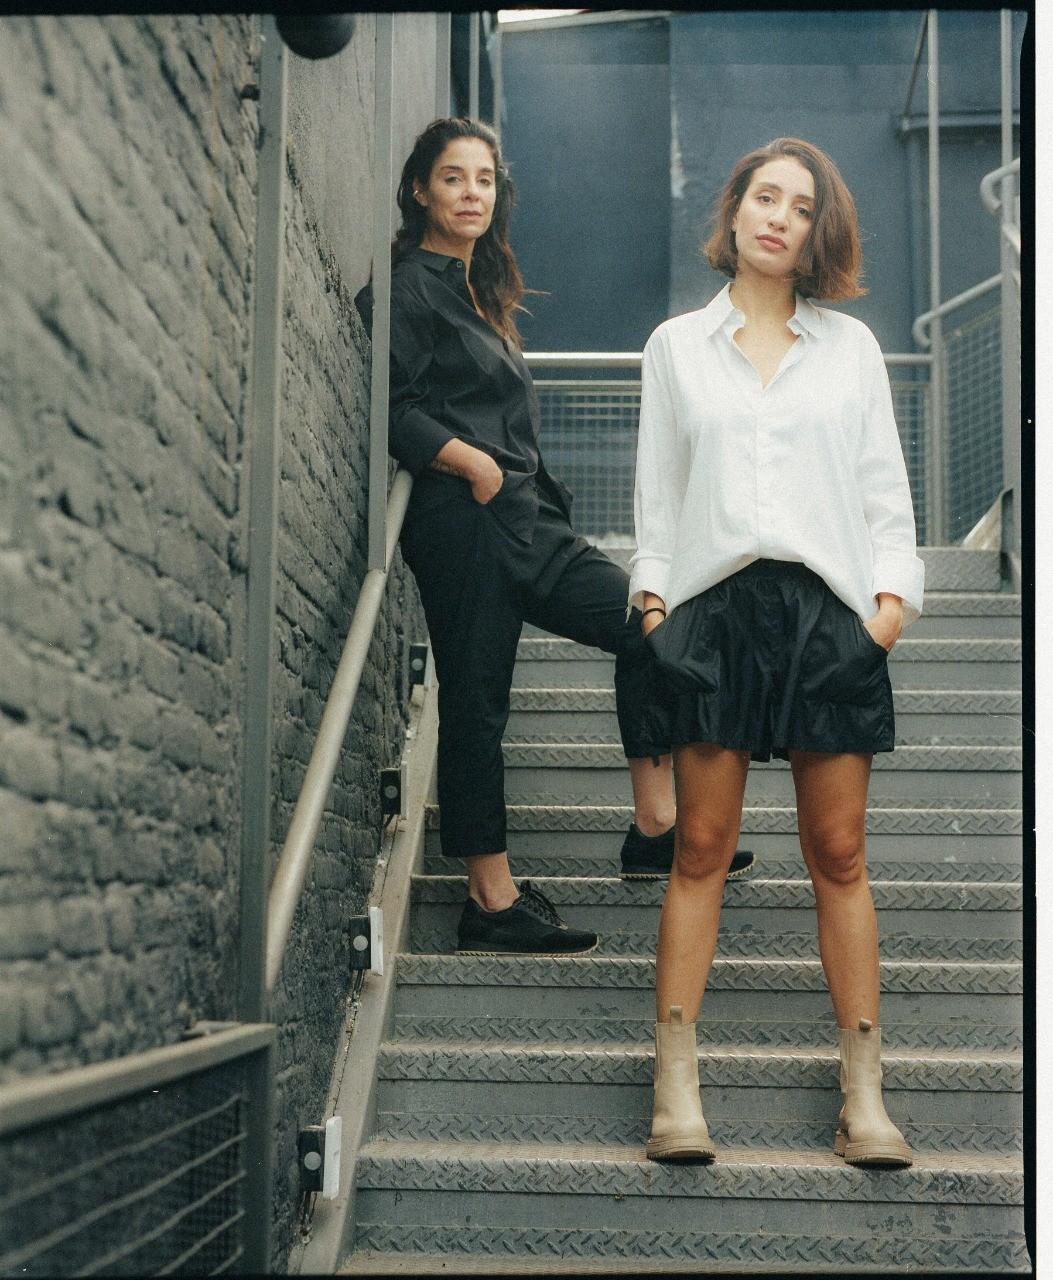 Raquel e Vanessa Davidowicz (Foto: Adasz)